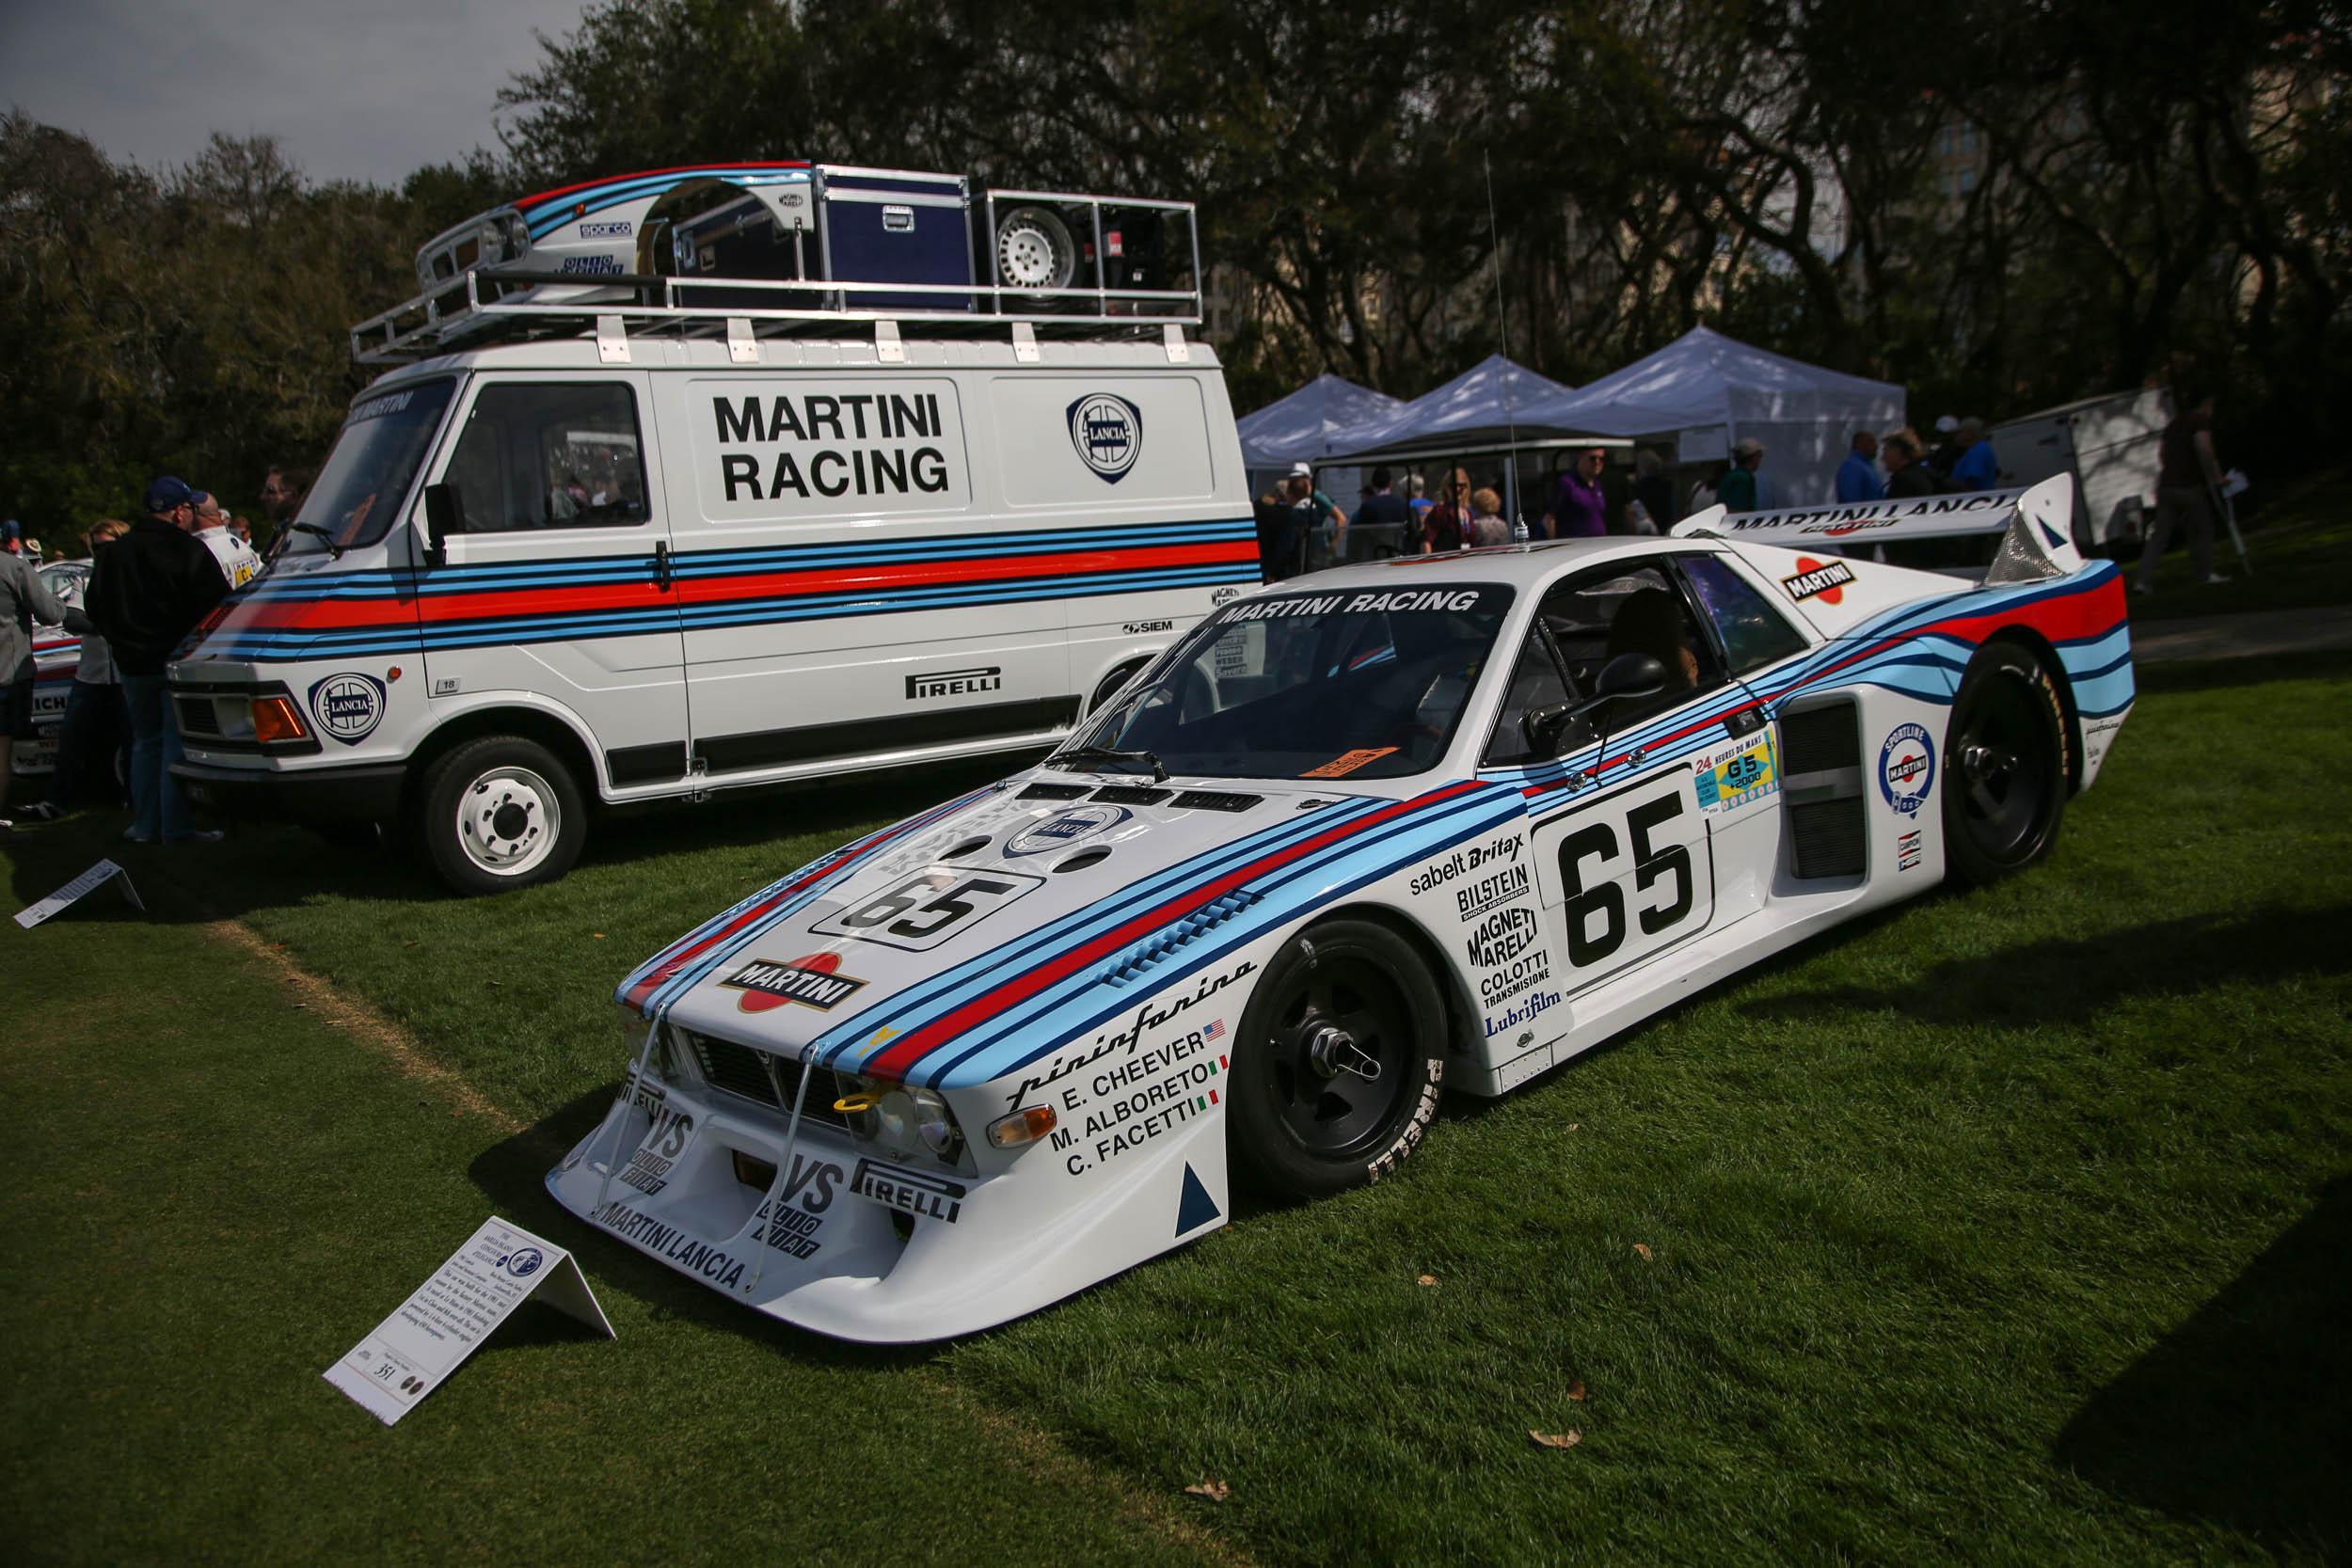 1985 Lancia at the Amelia Island 2018 concours